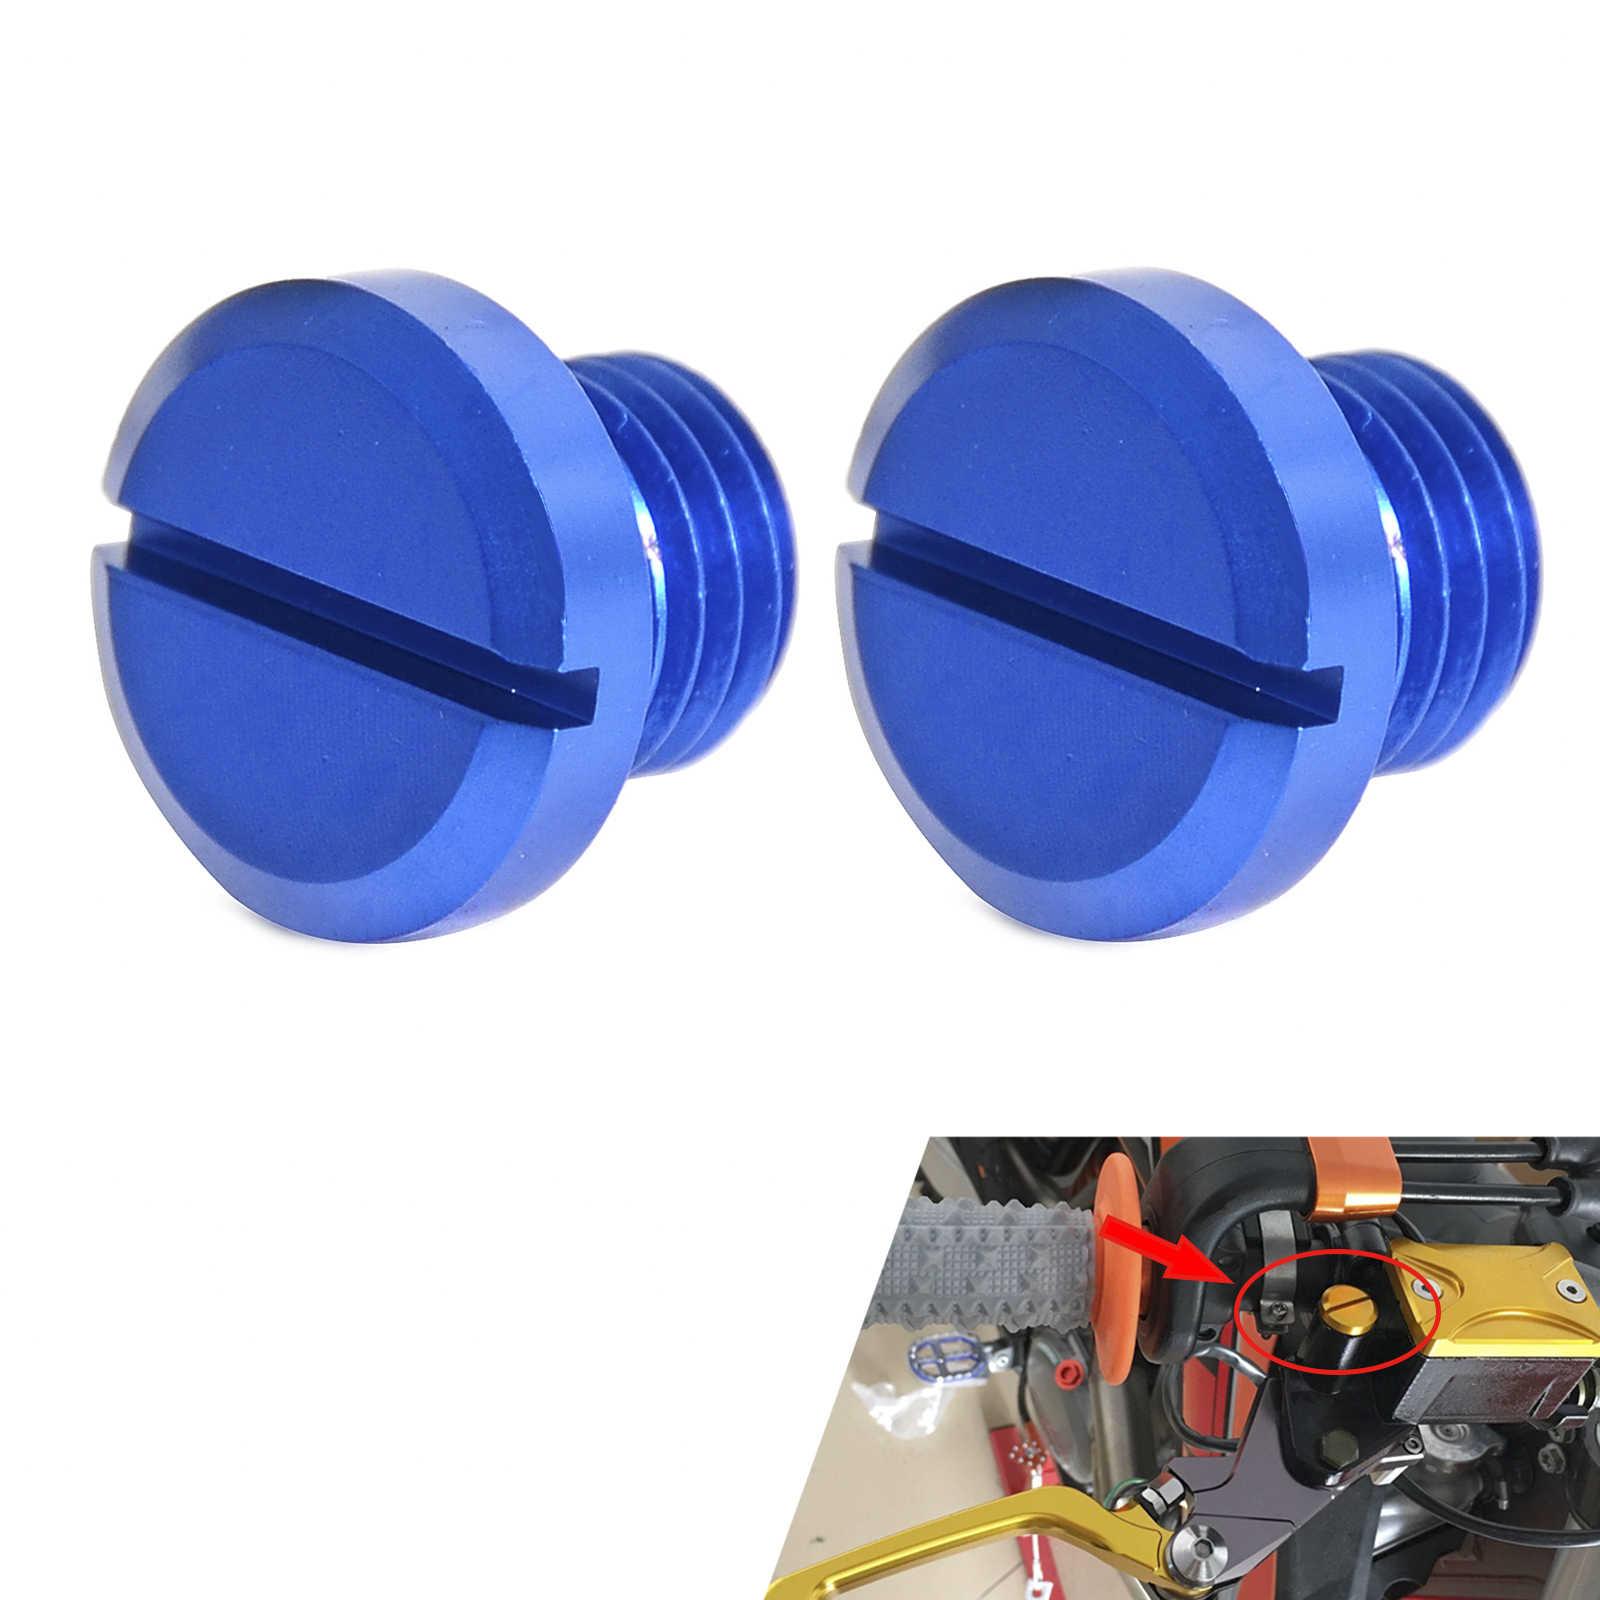 2 Pcs M10 * 1.25 Kiri Tangan Kanan Ulir Cermin Hole Plug Baut Sekrup untuk Yamaha FZ09 FZ07 MT07 MT09 MT25 MT03 Tracer900 XSR900